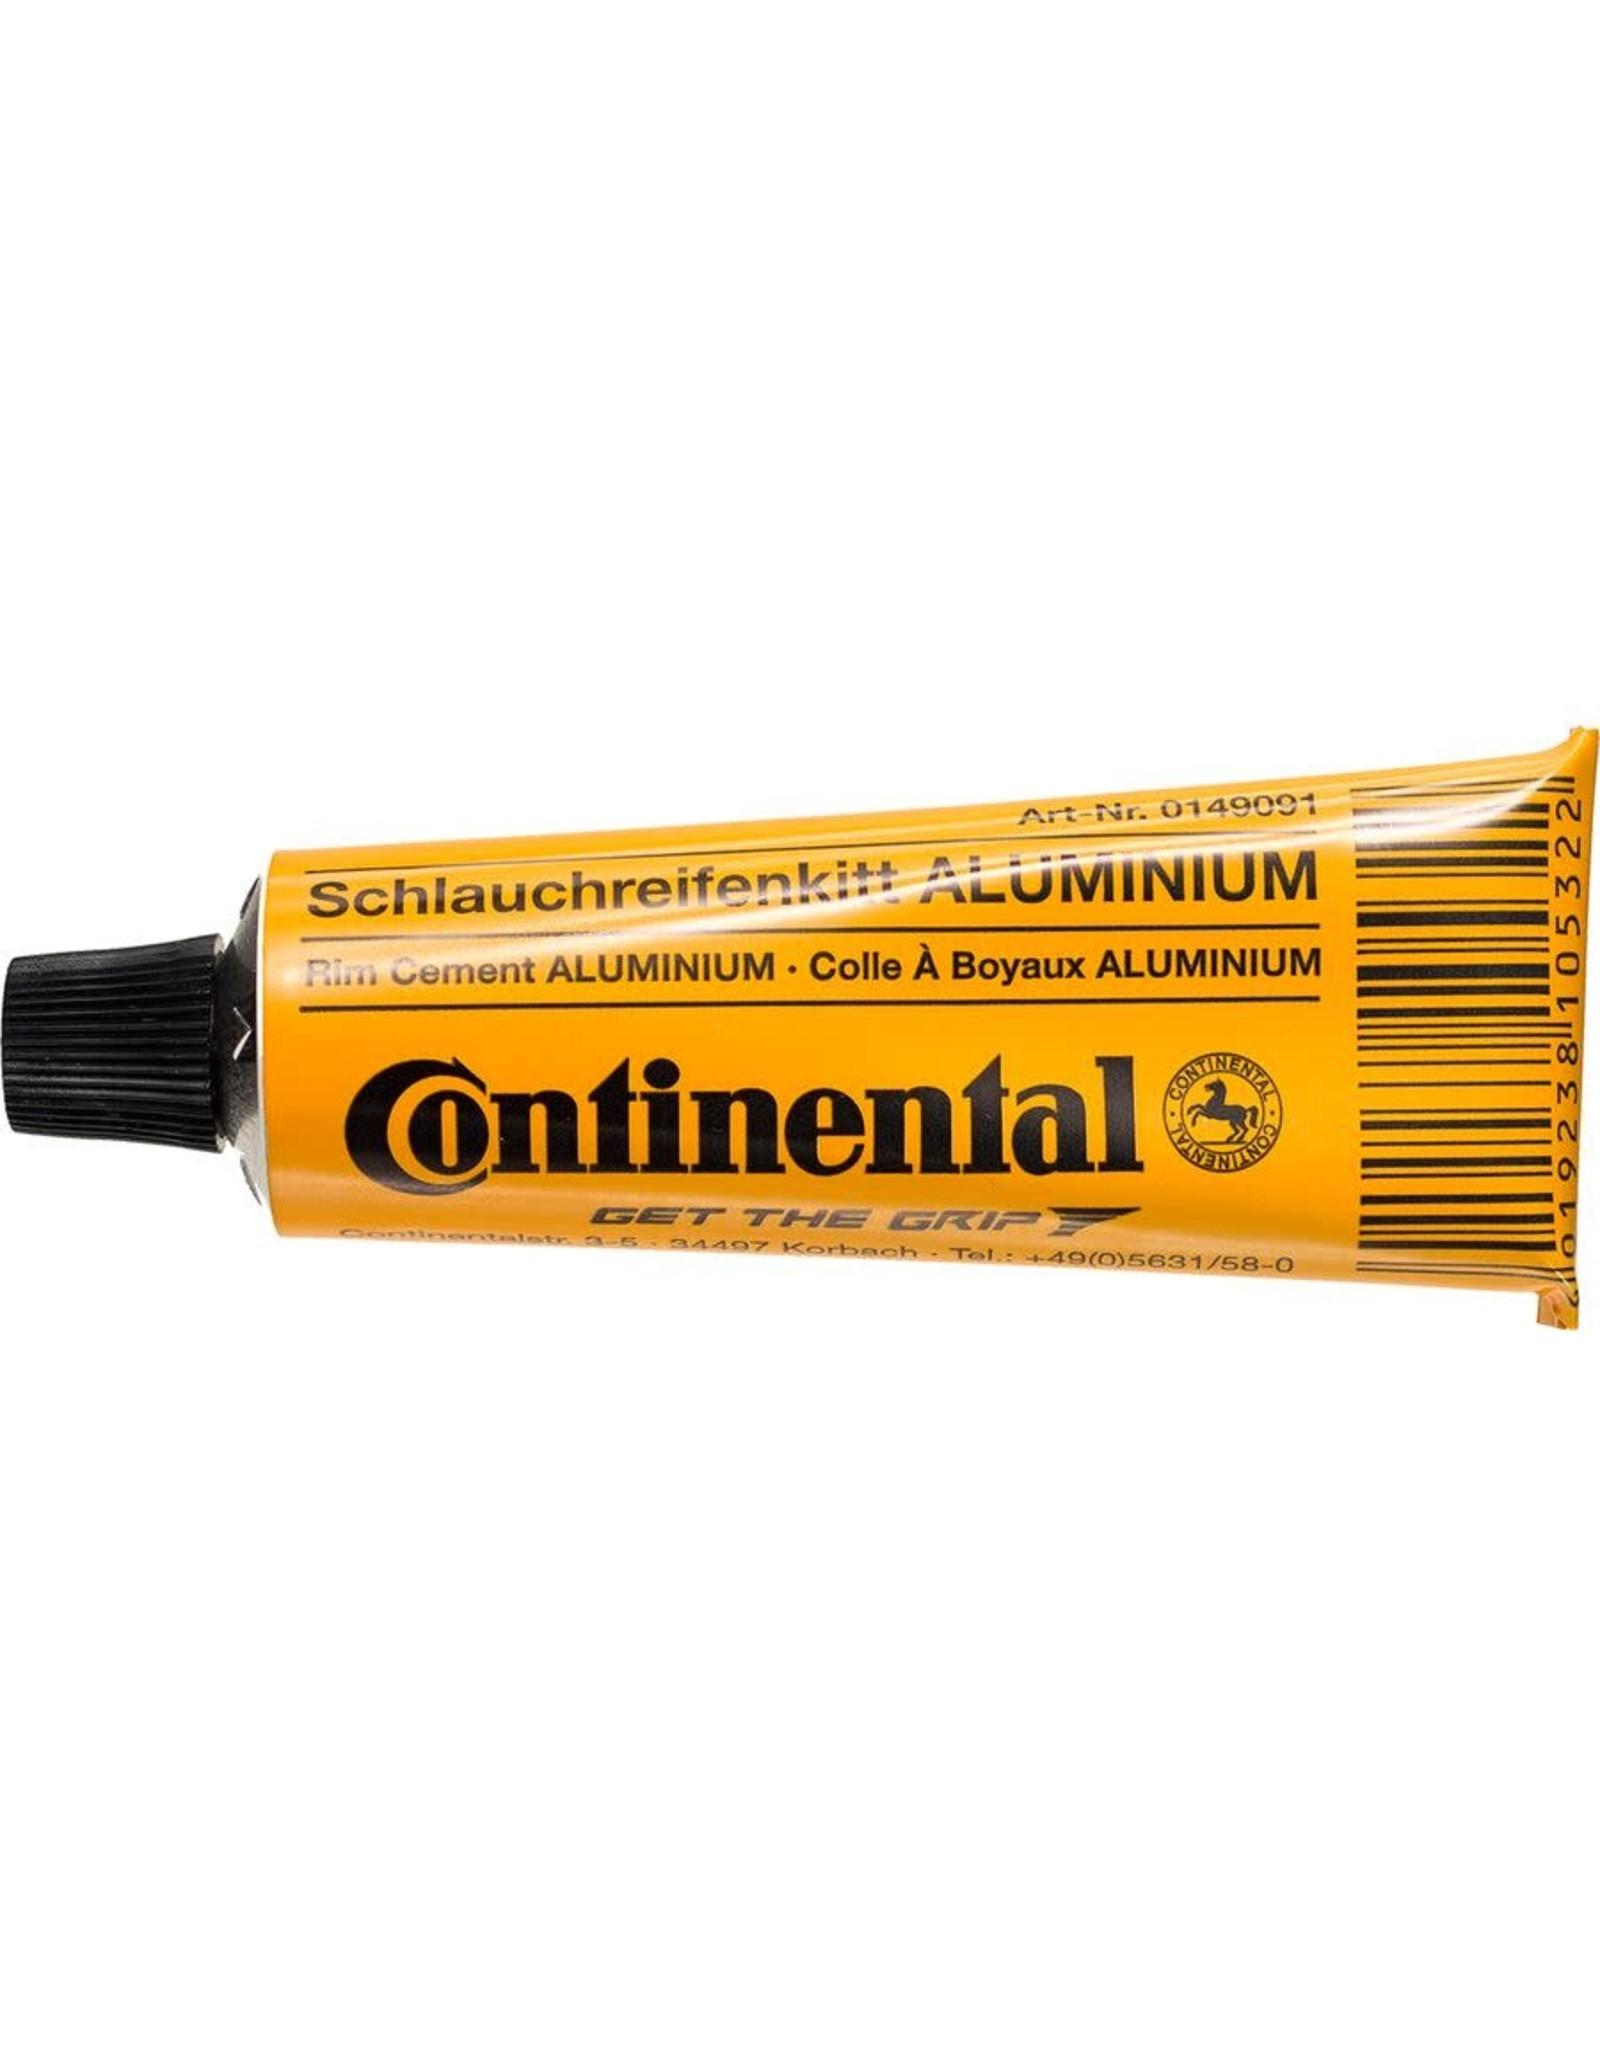 Continental CONTINENTAL, Rim Cement, Aluminum, Tube